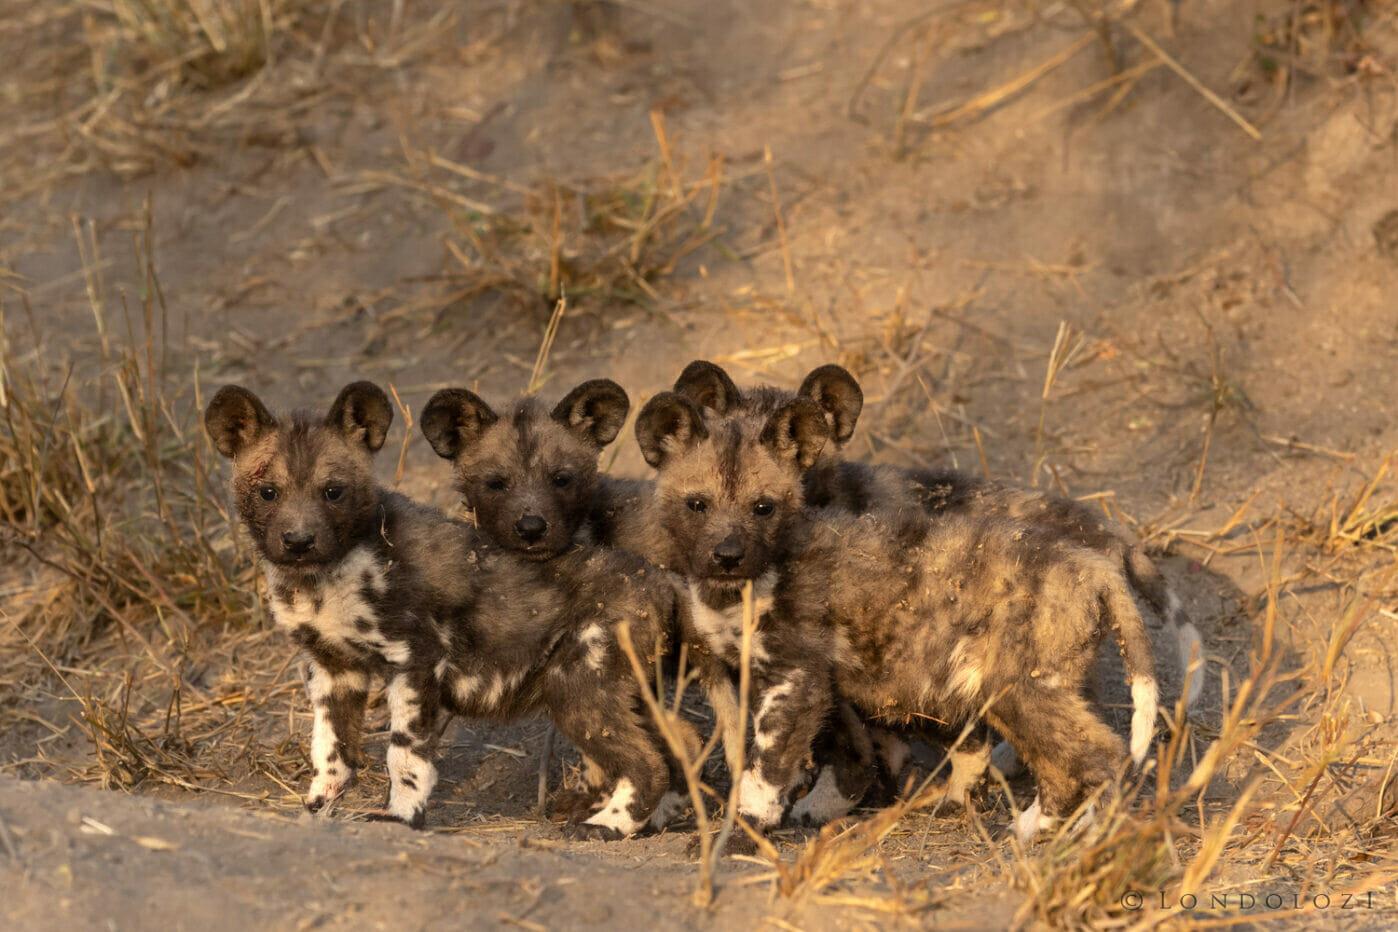 GB-wilddog pups lined up